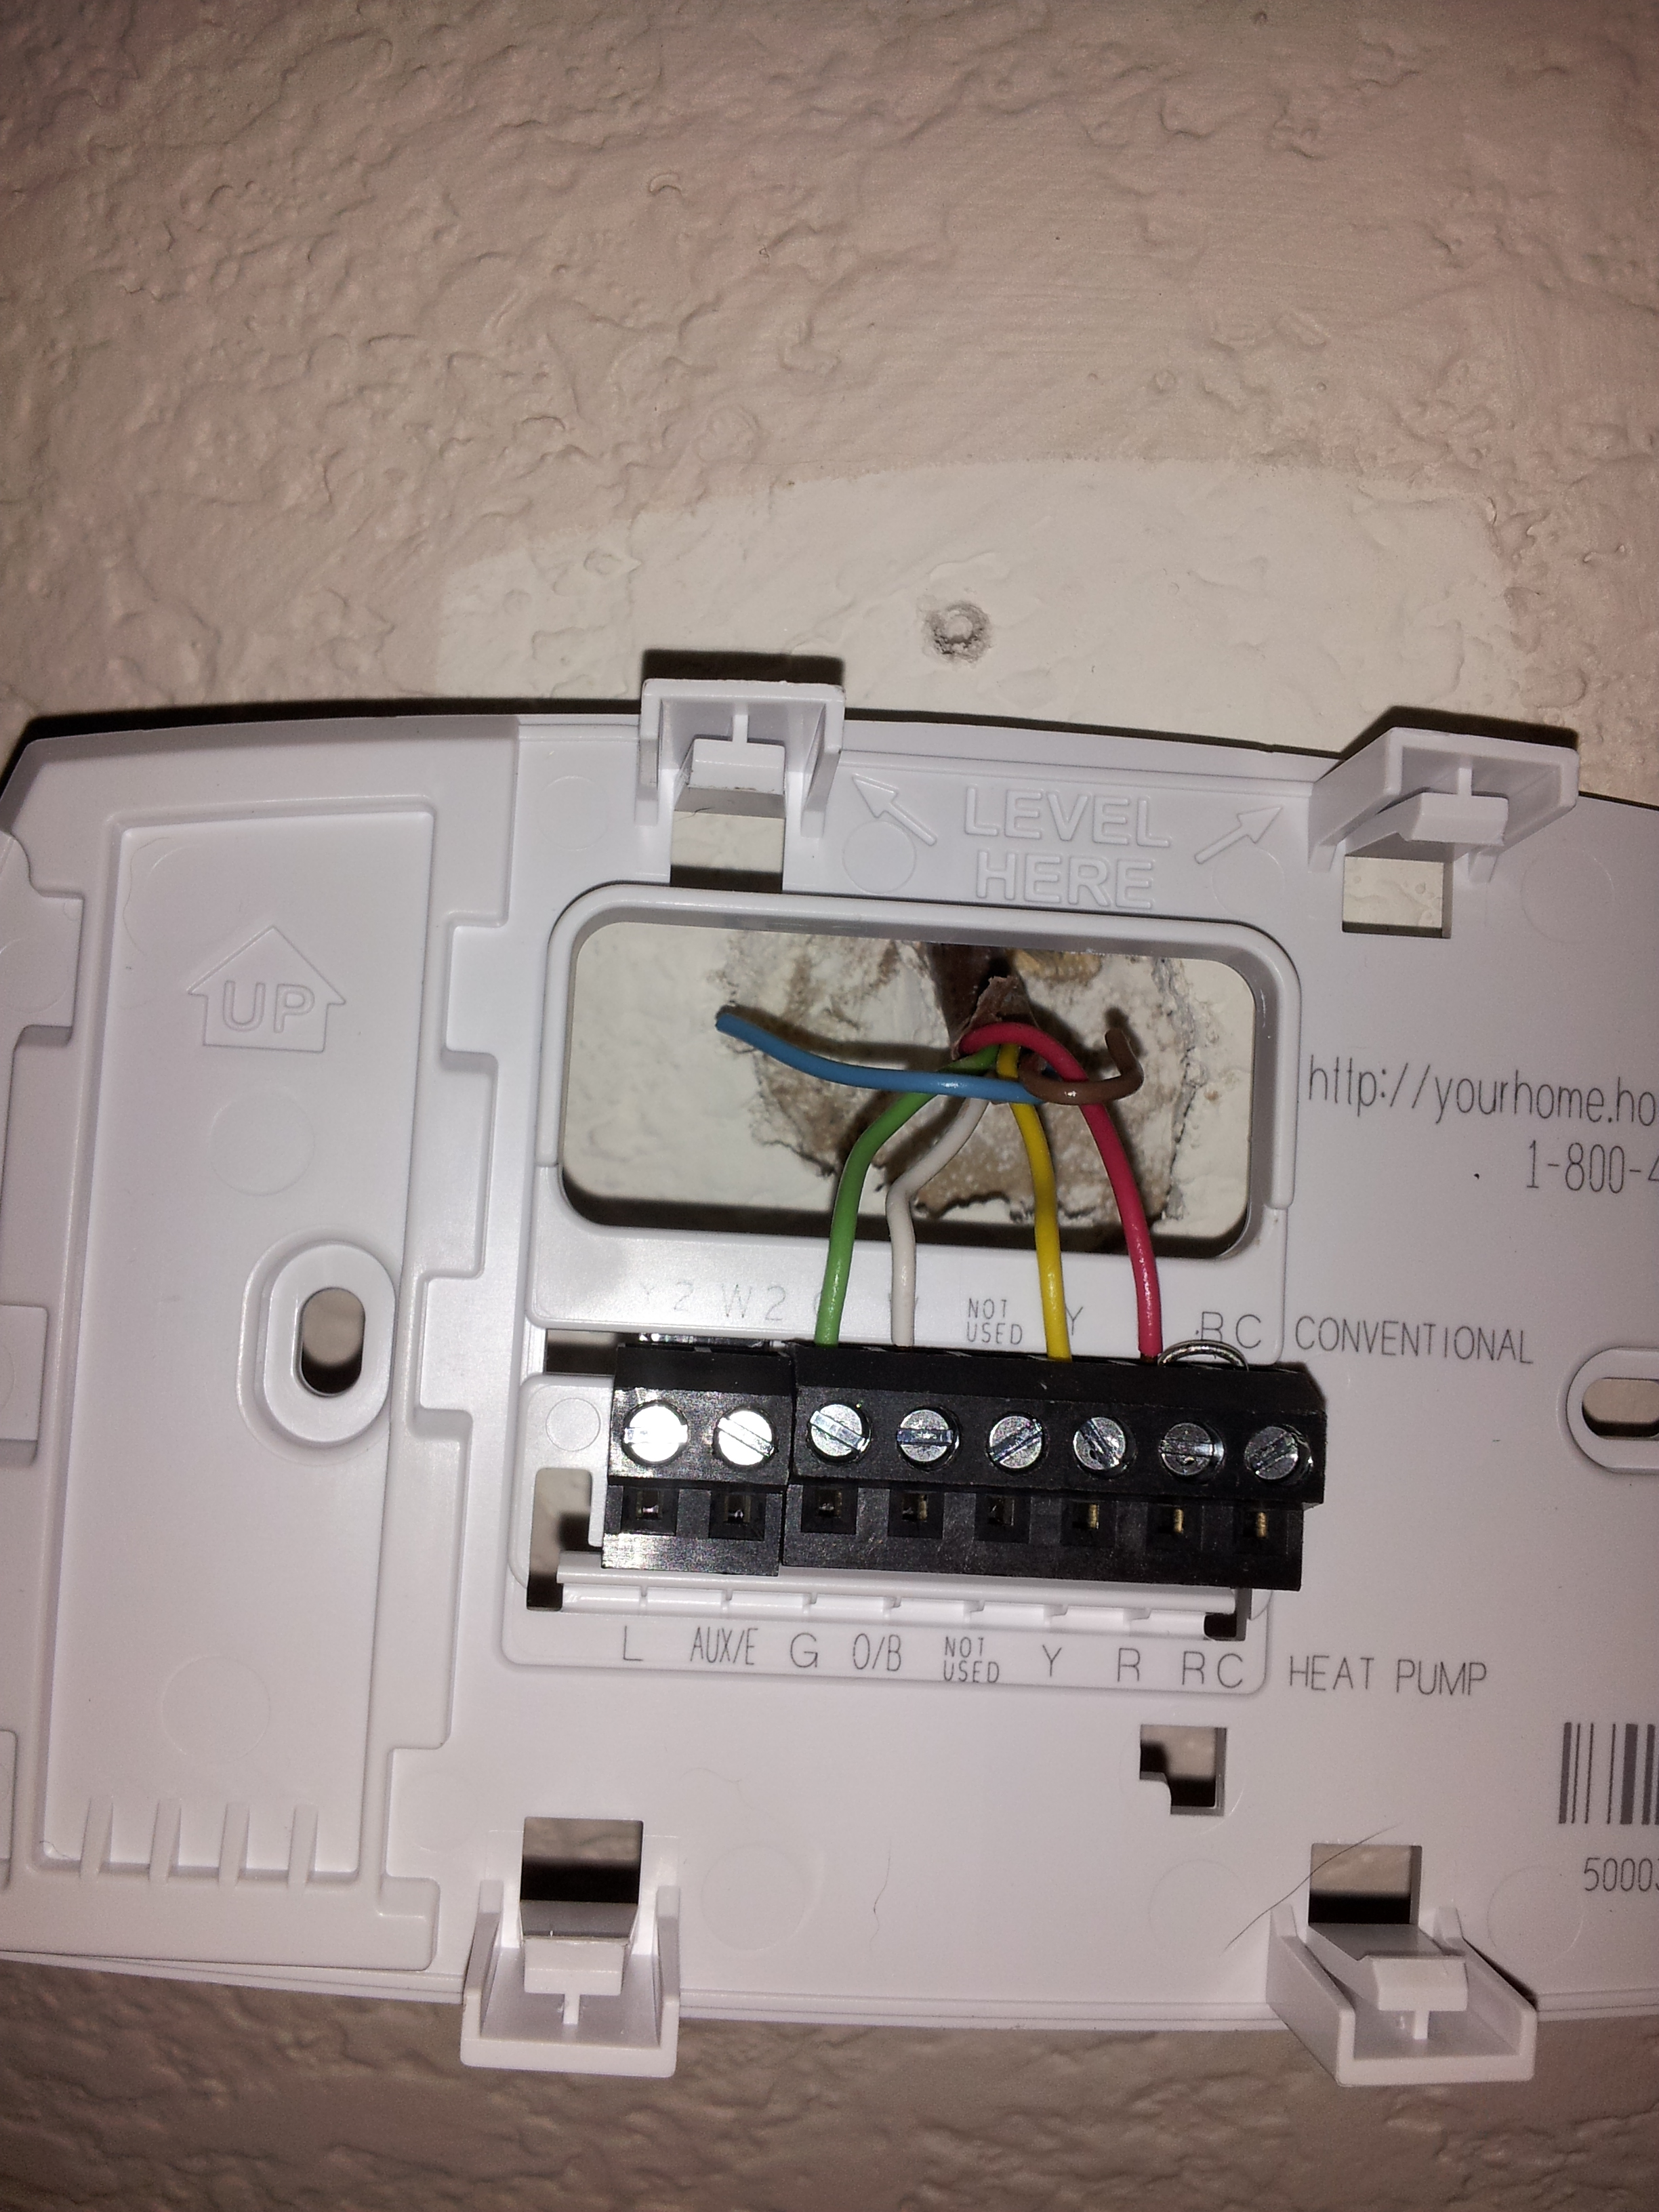 100 honeywell thermostat rth7500 web design process flowchart i1wpcoms3amazonawscomf01justanswercomjacu 2014 01 20 030659 20140119 195256 wiring diagram honeywell thermostat rthl2310bhtml cheapraybanclubmaster Images